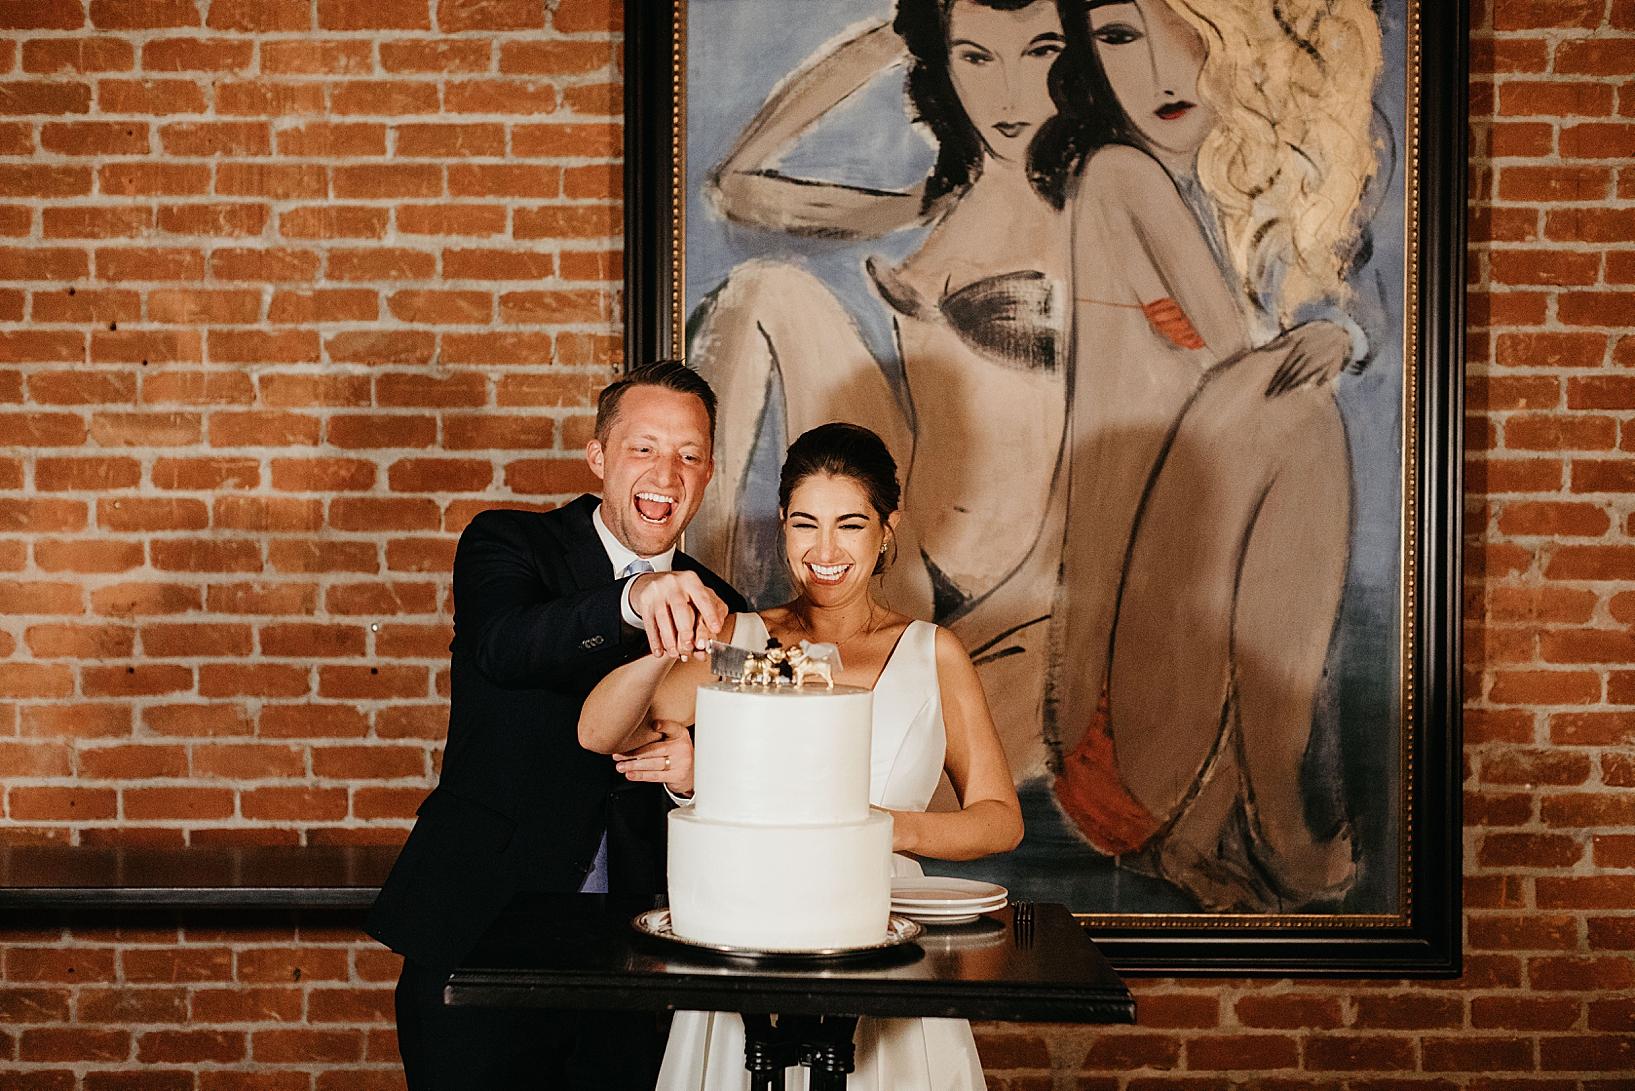 Herb-and-Wood-Wedding-100.jpg